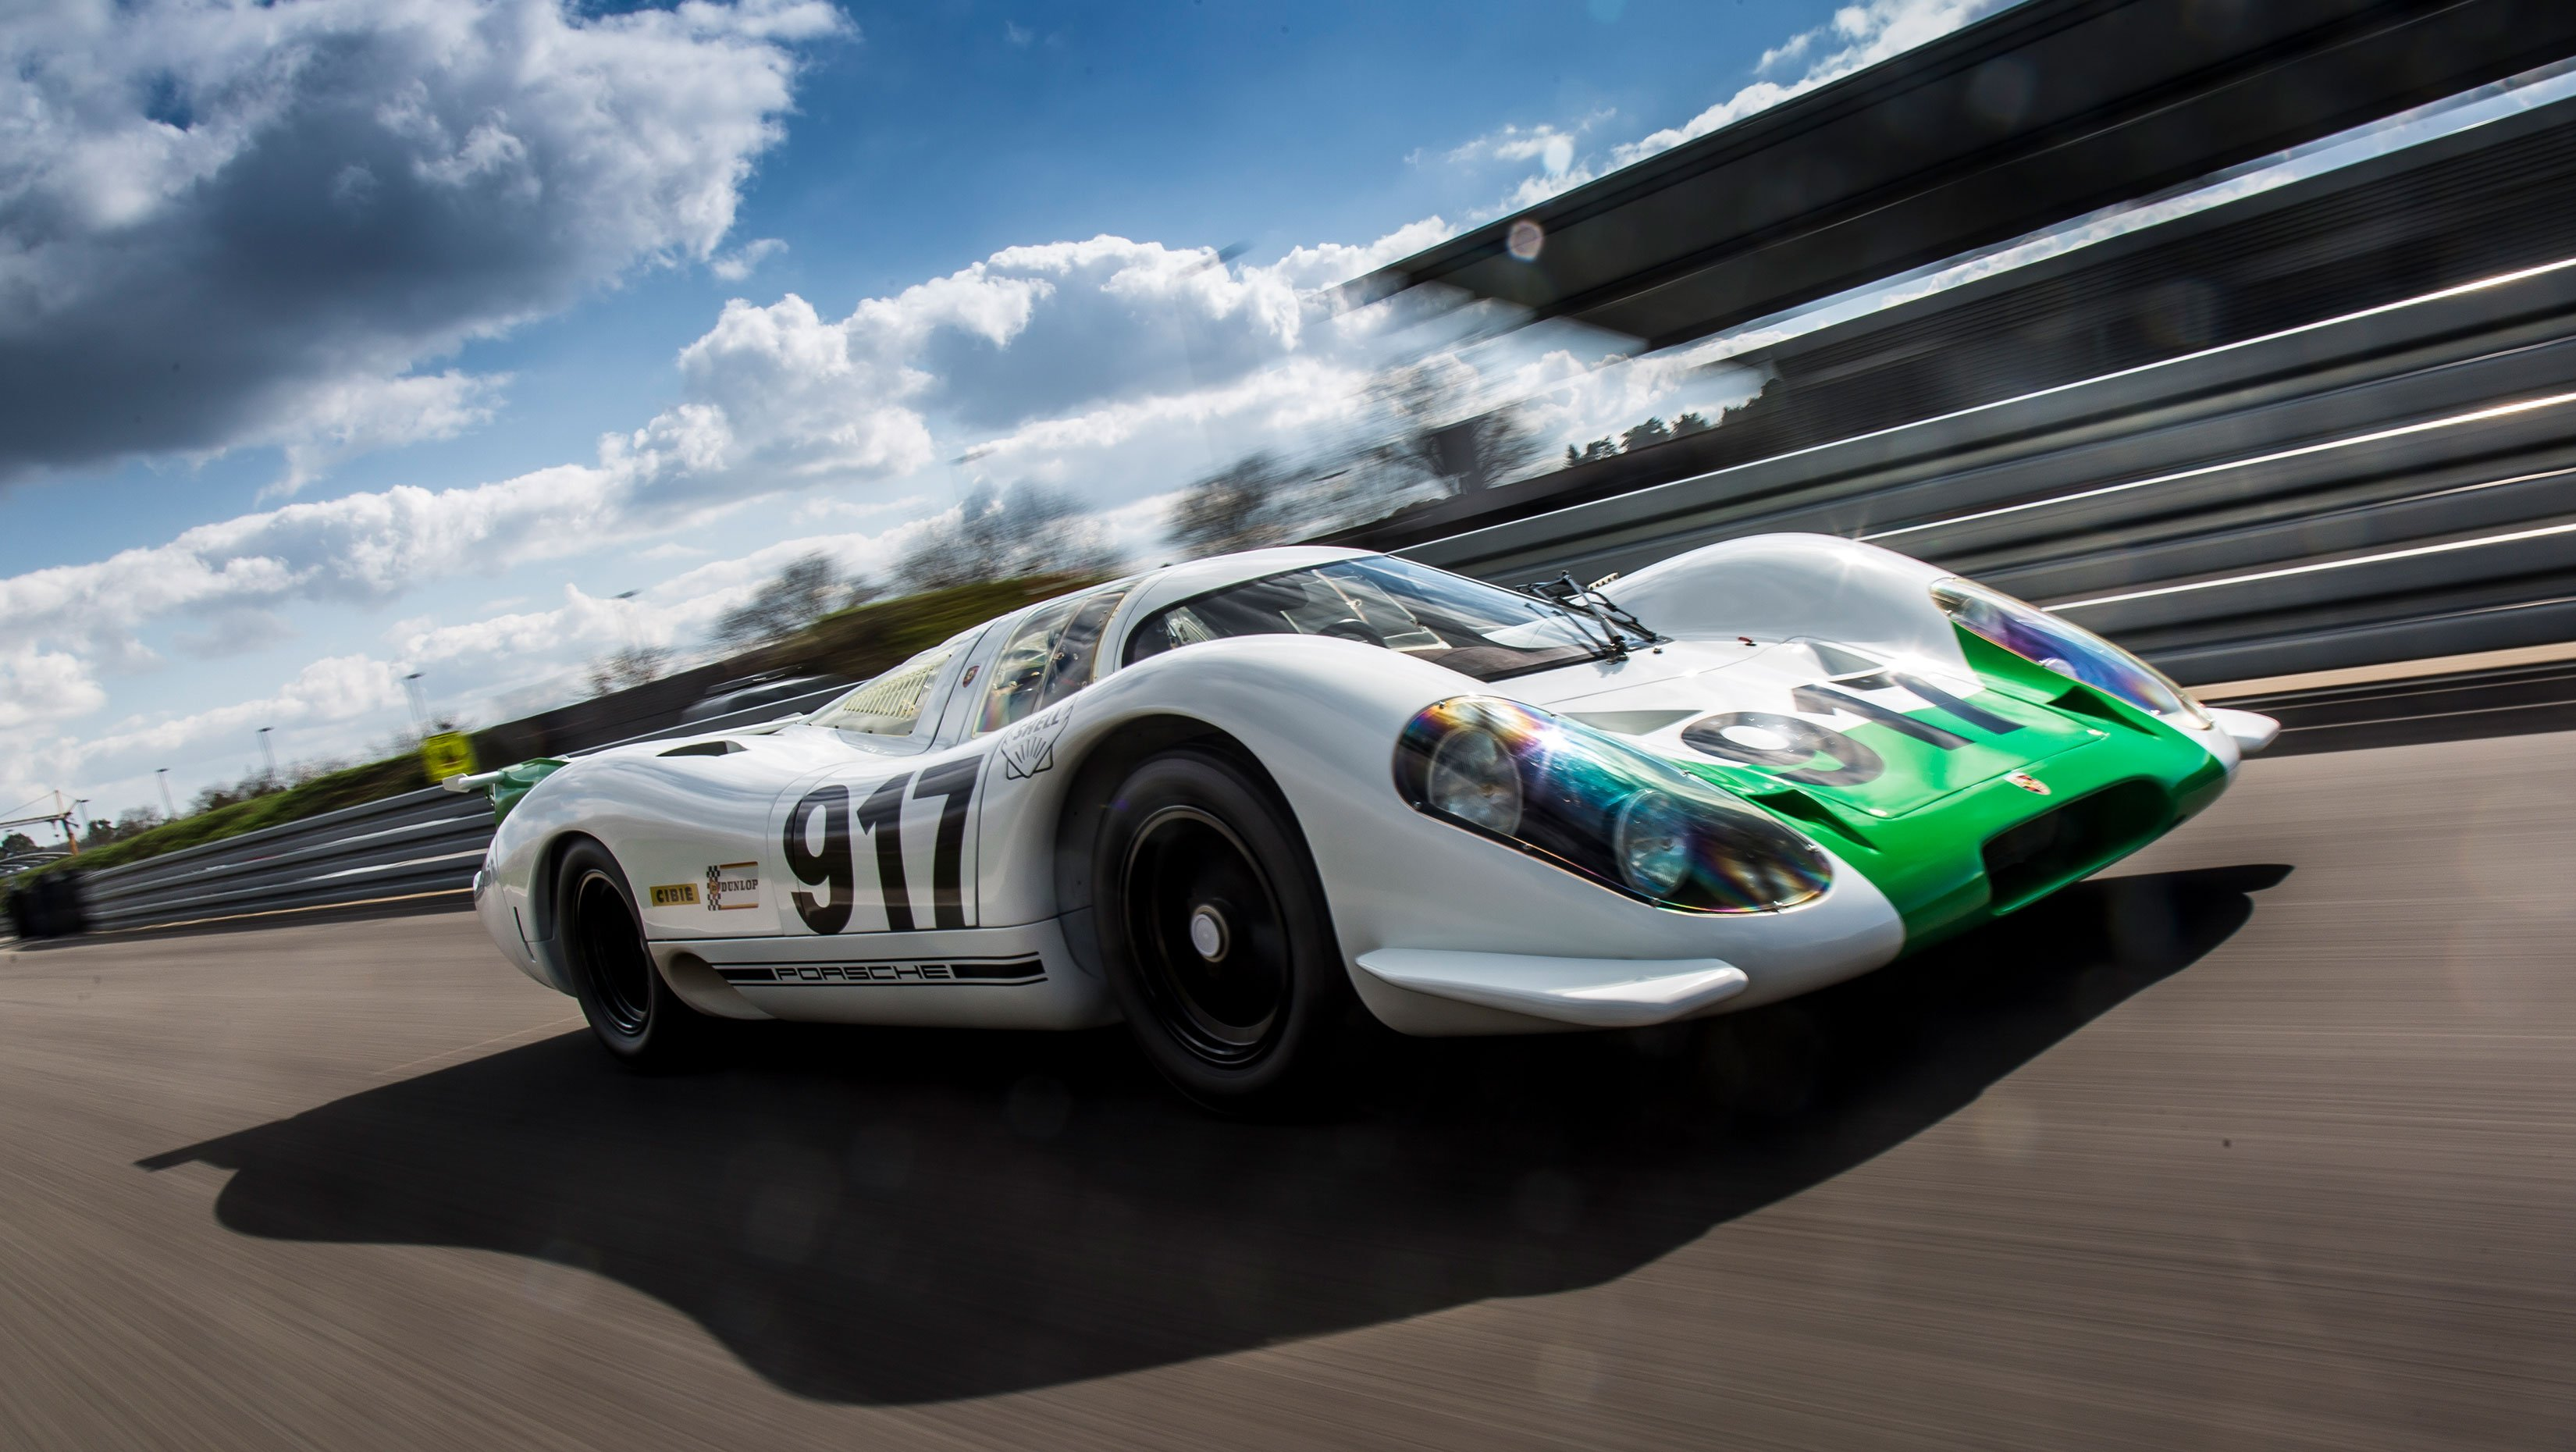 Restored Original Porsche 917